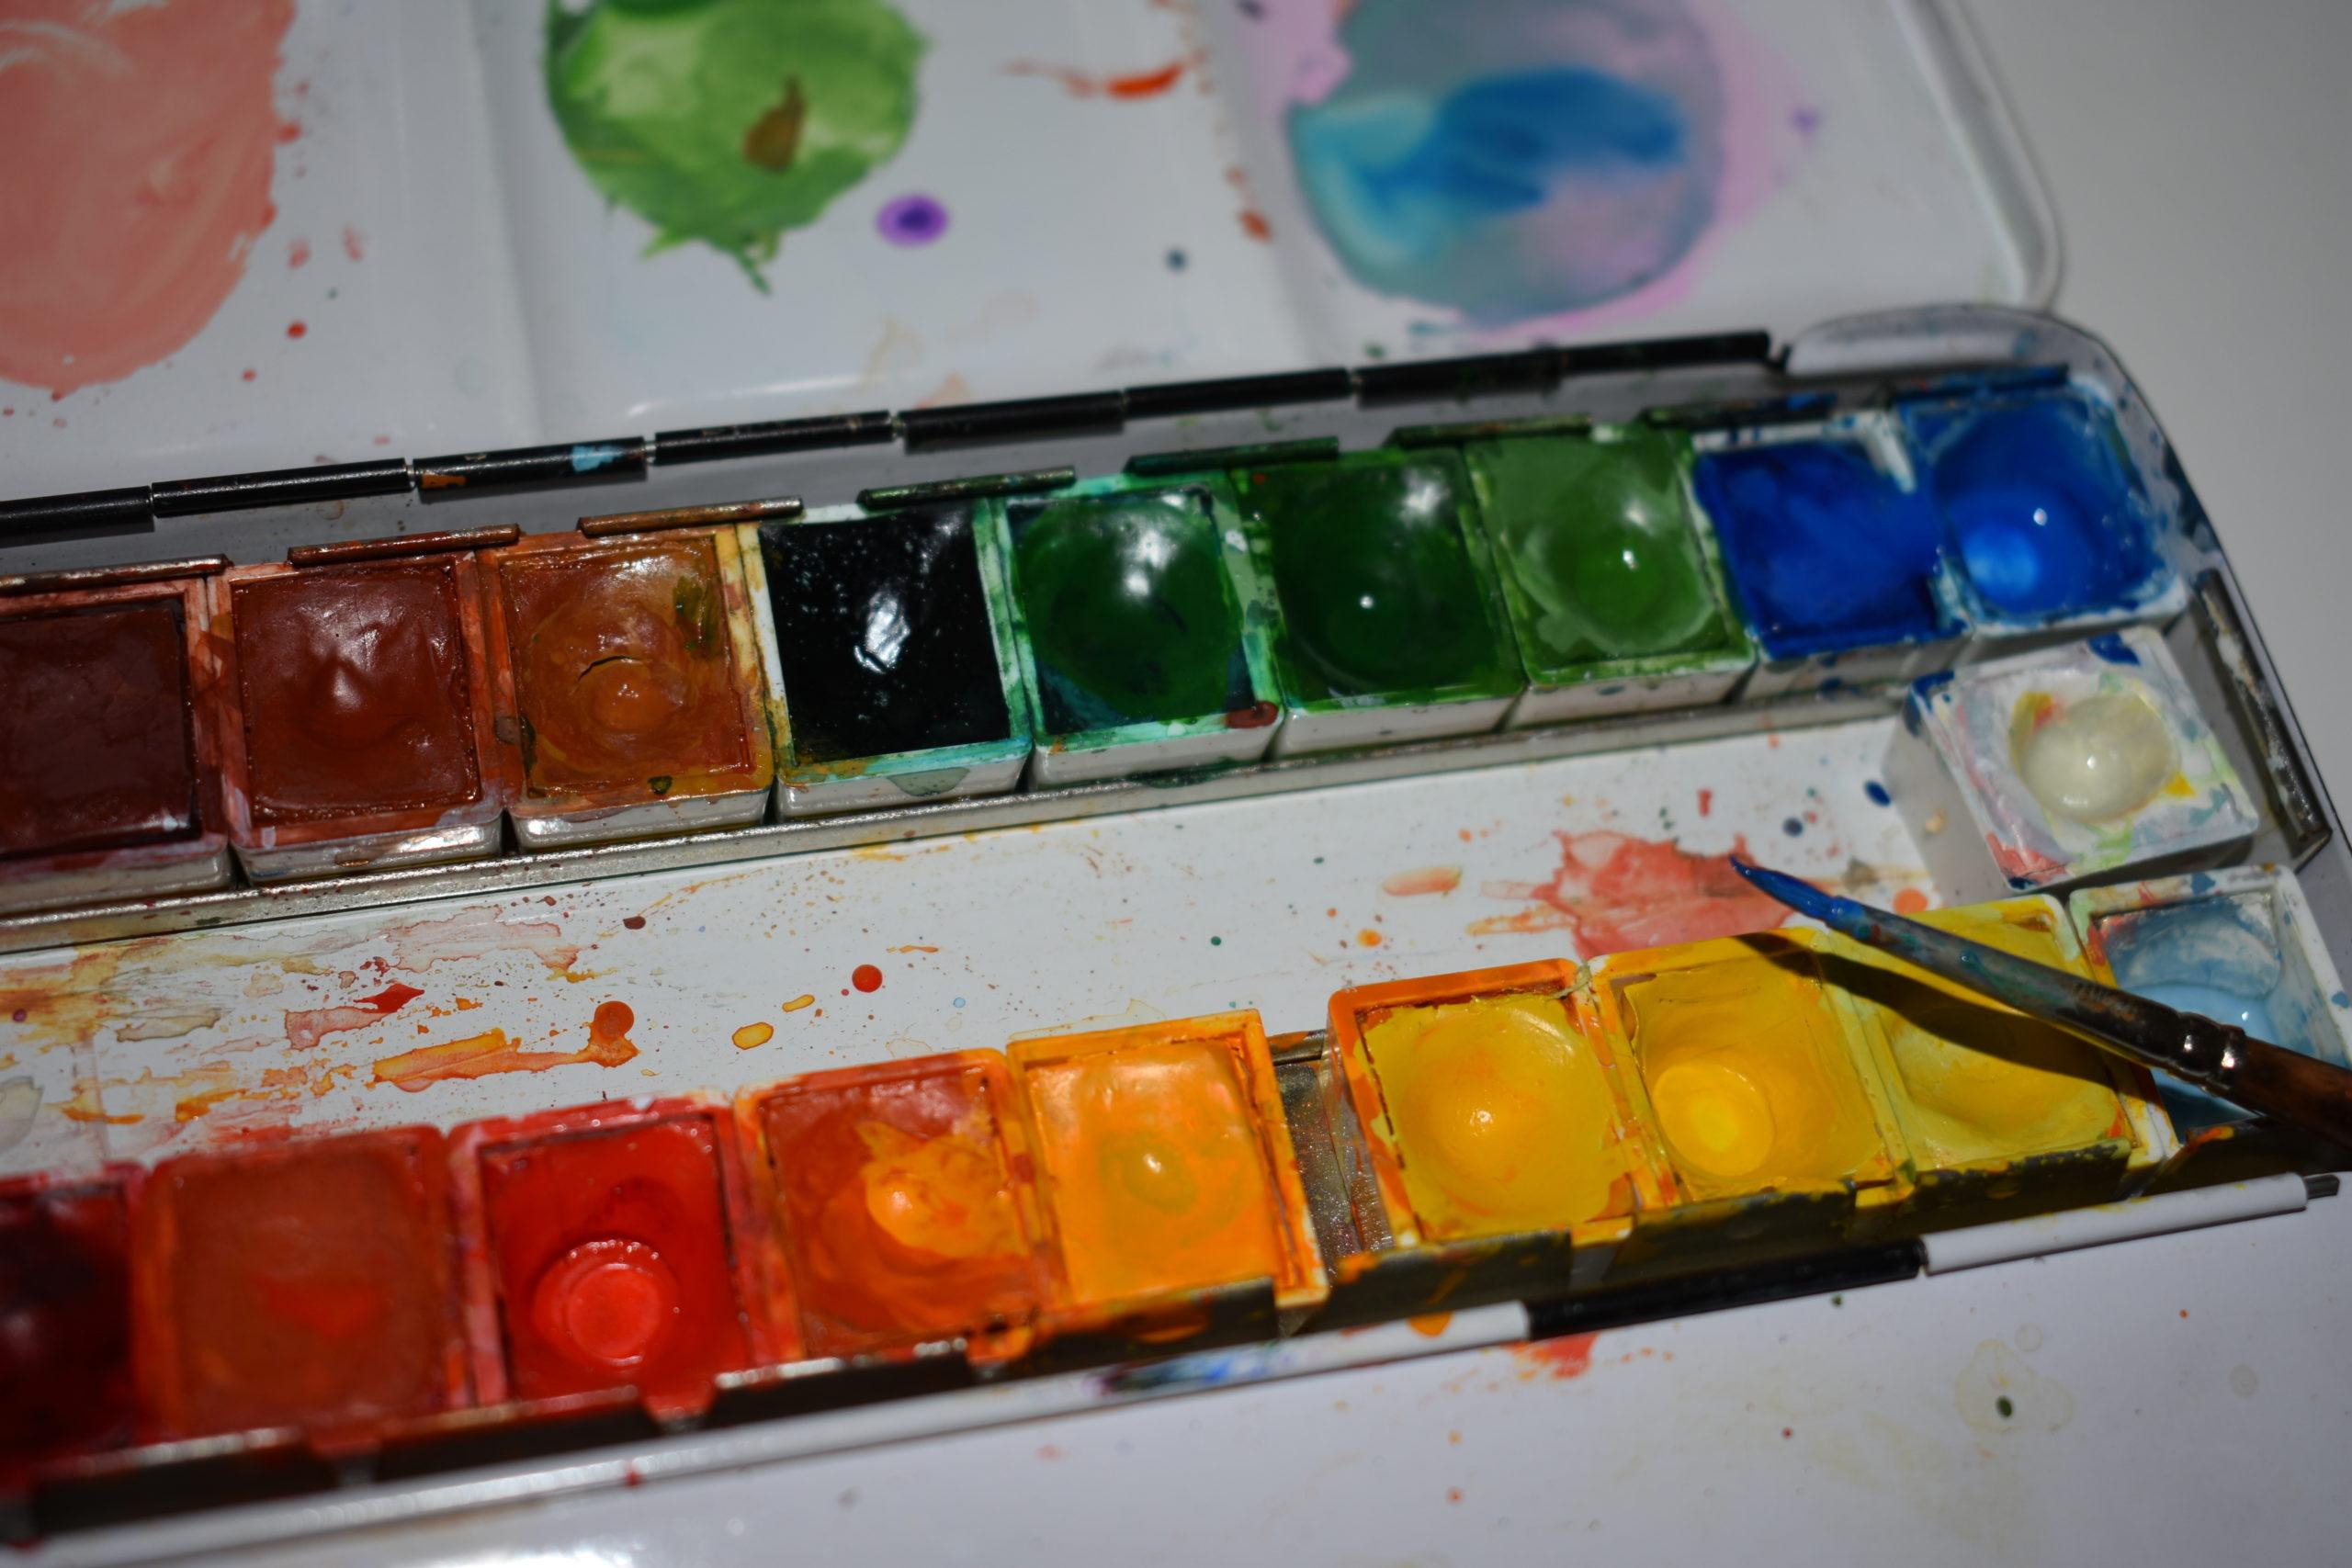 Kreativtraining - Kreativität als Schlüsselkompetenz